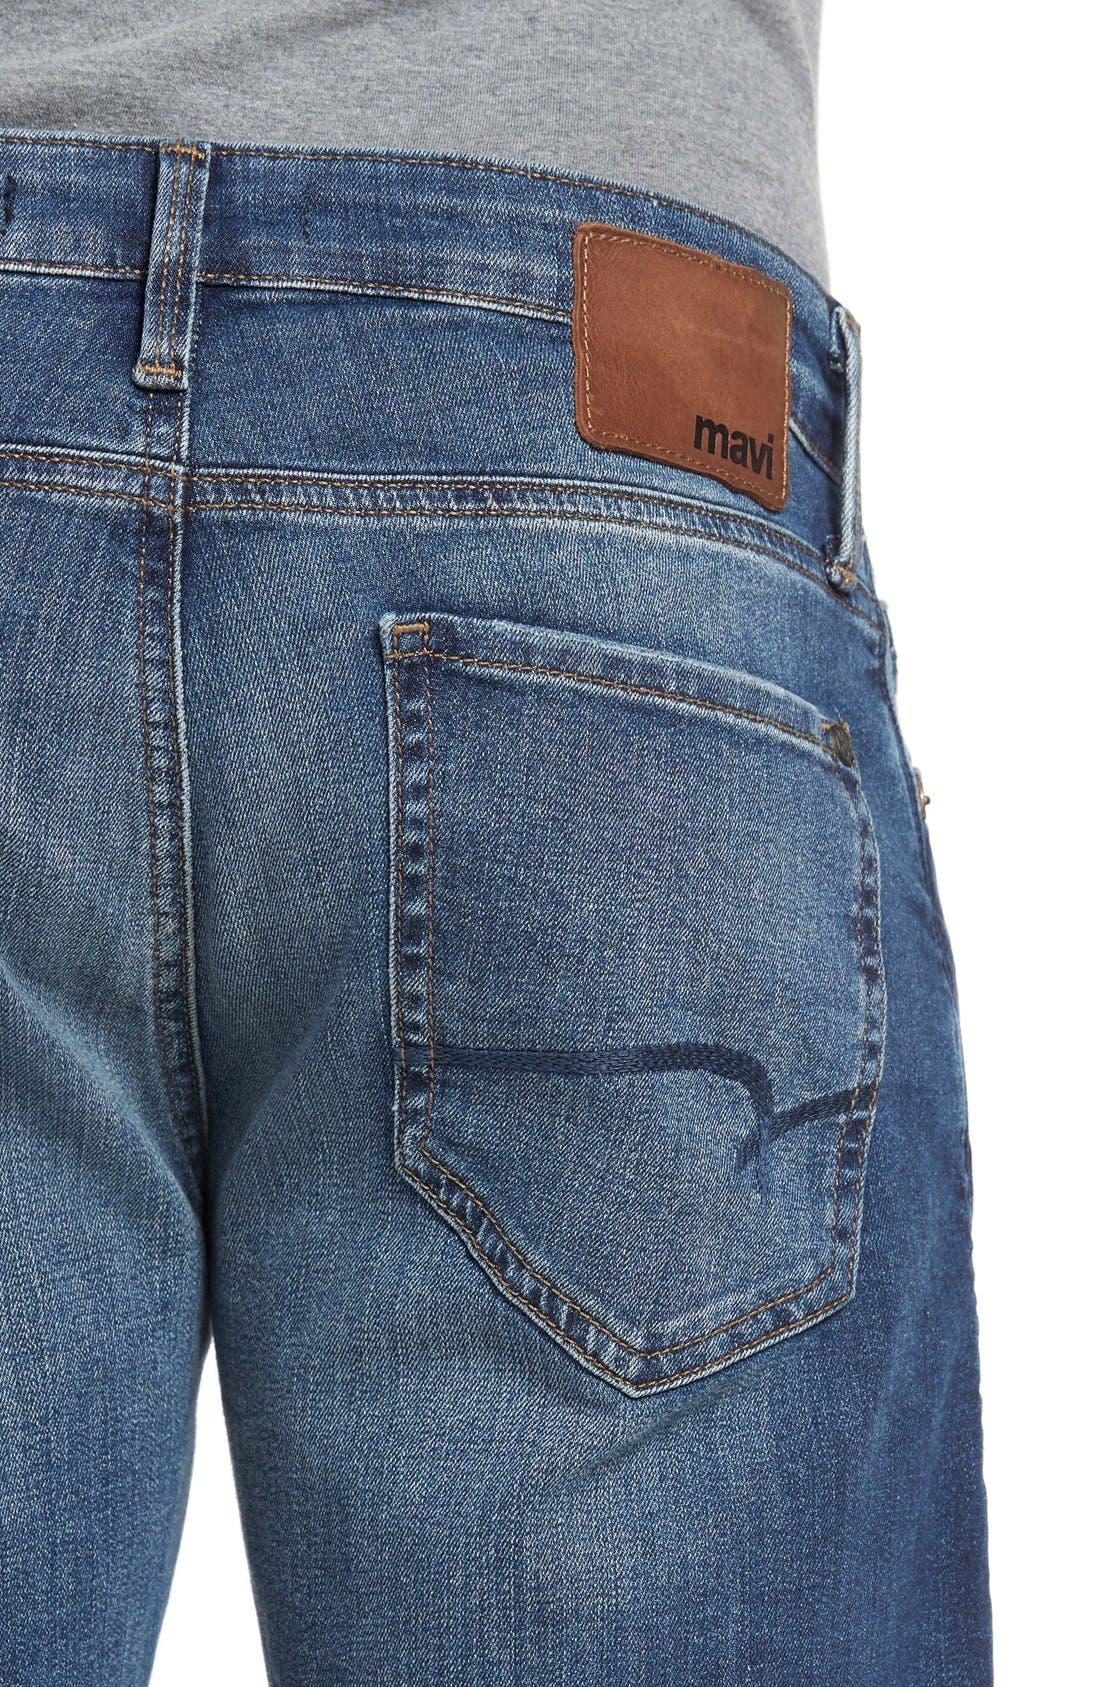 Alternate Image 4  - Mavi Jeans 'Zach' Straight Leg Jeans (Mid Blue)